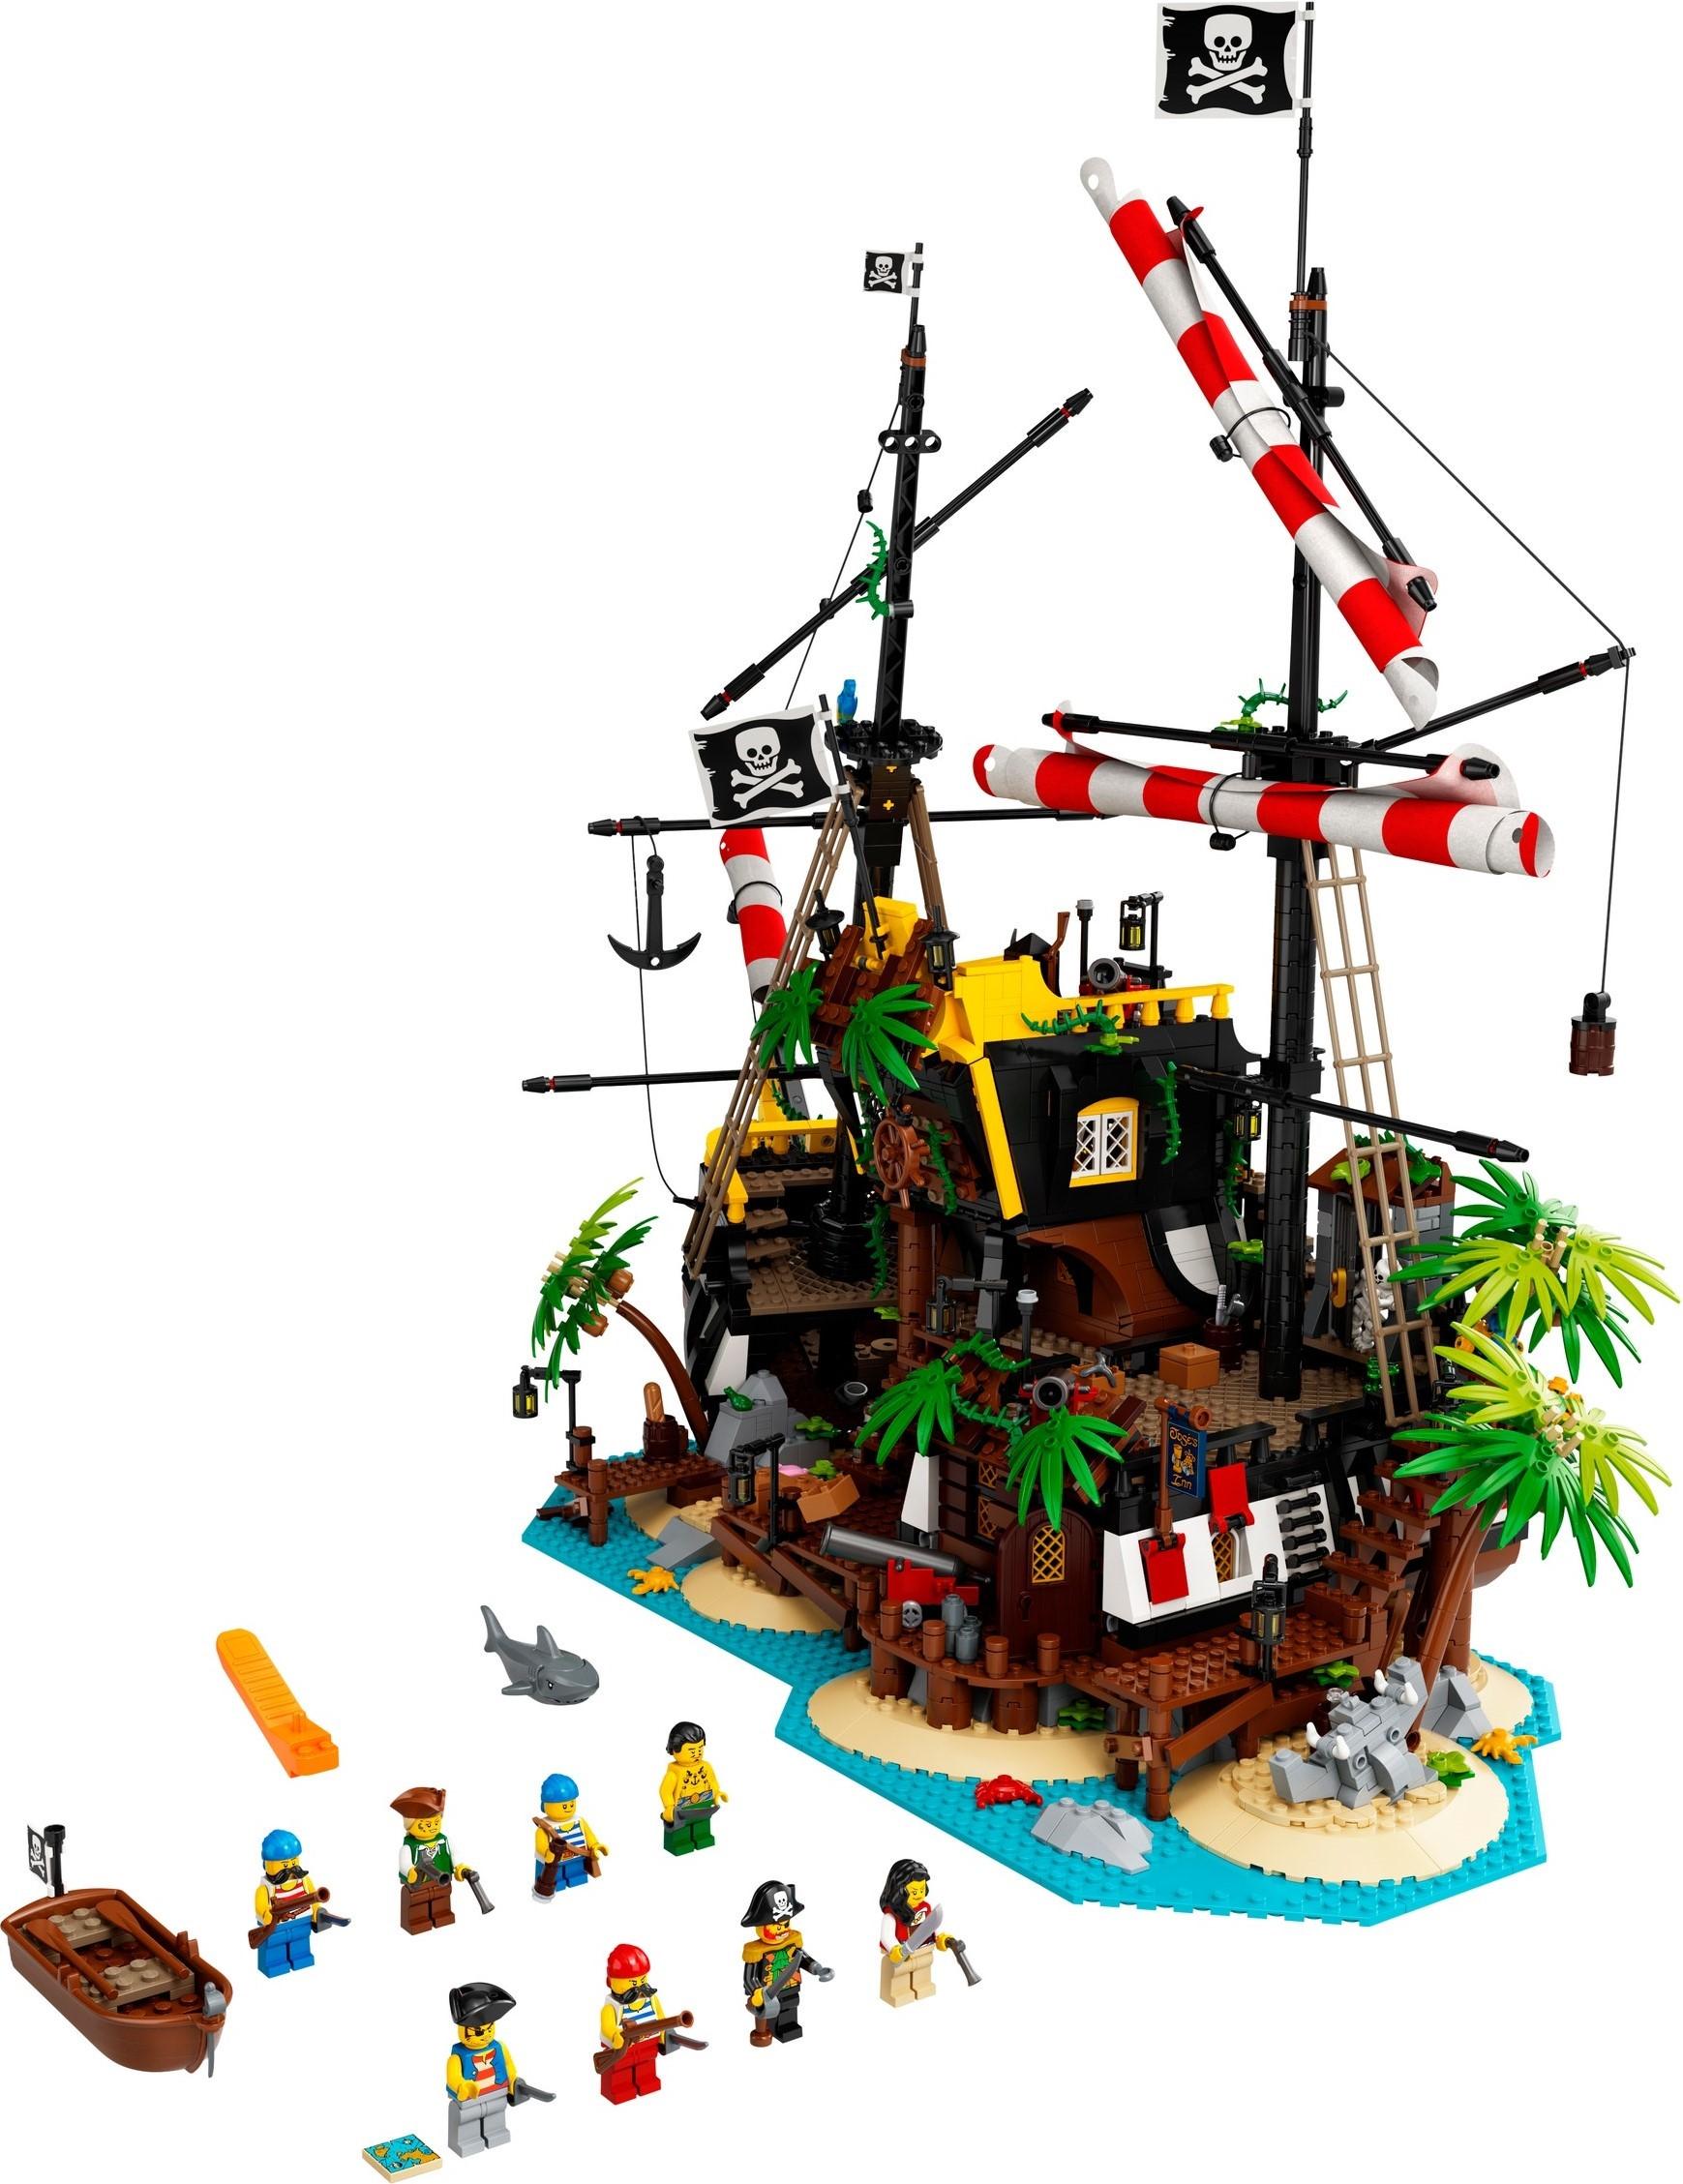 Pirates of Barracuda Bay set